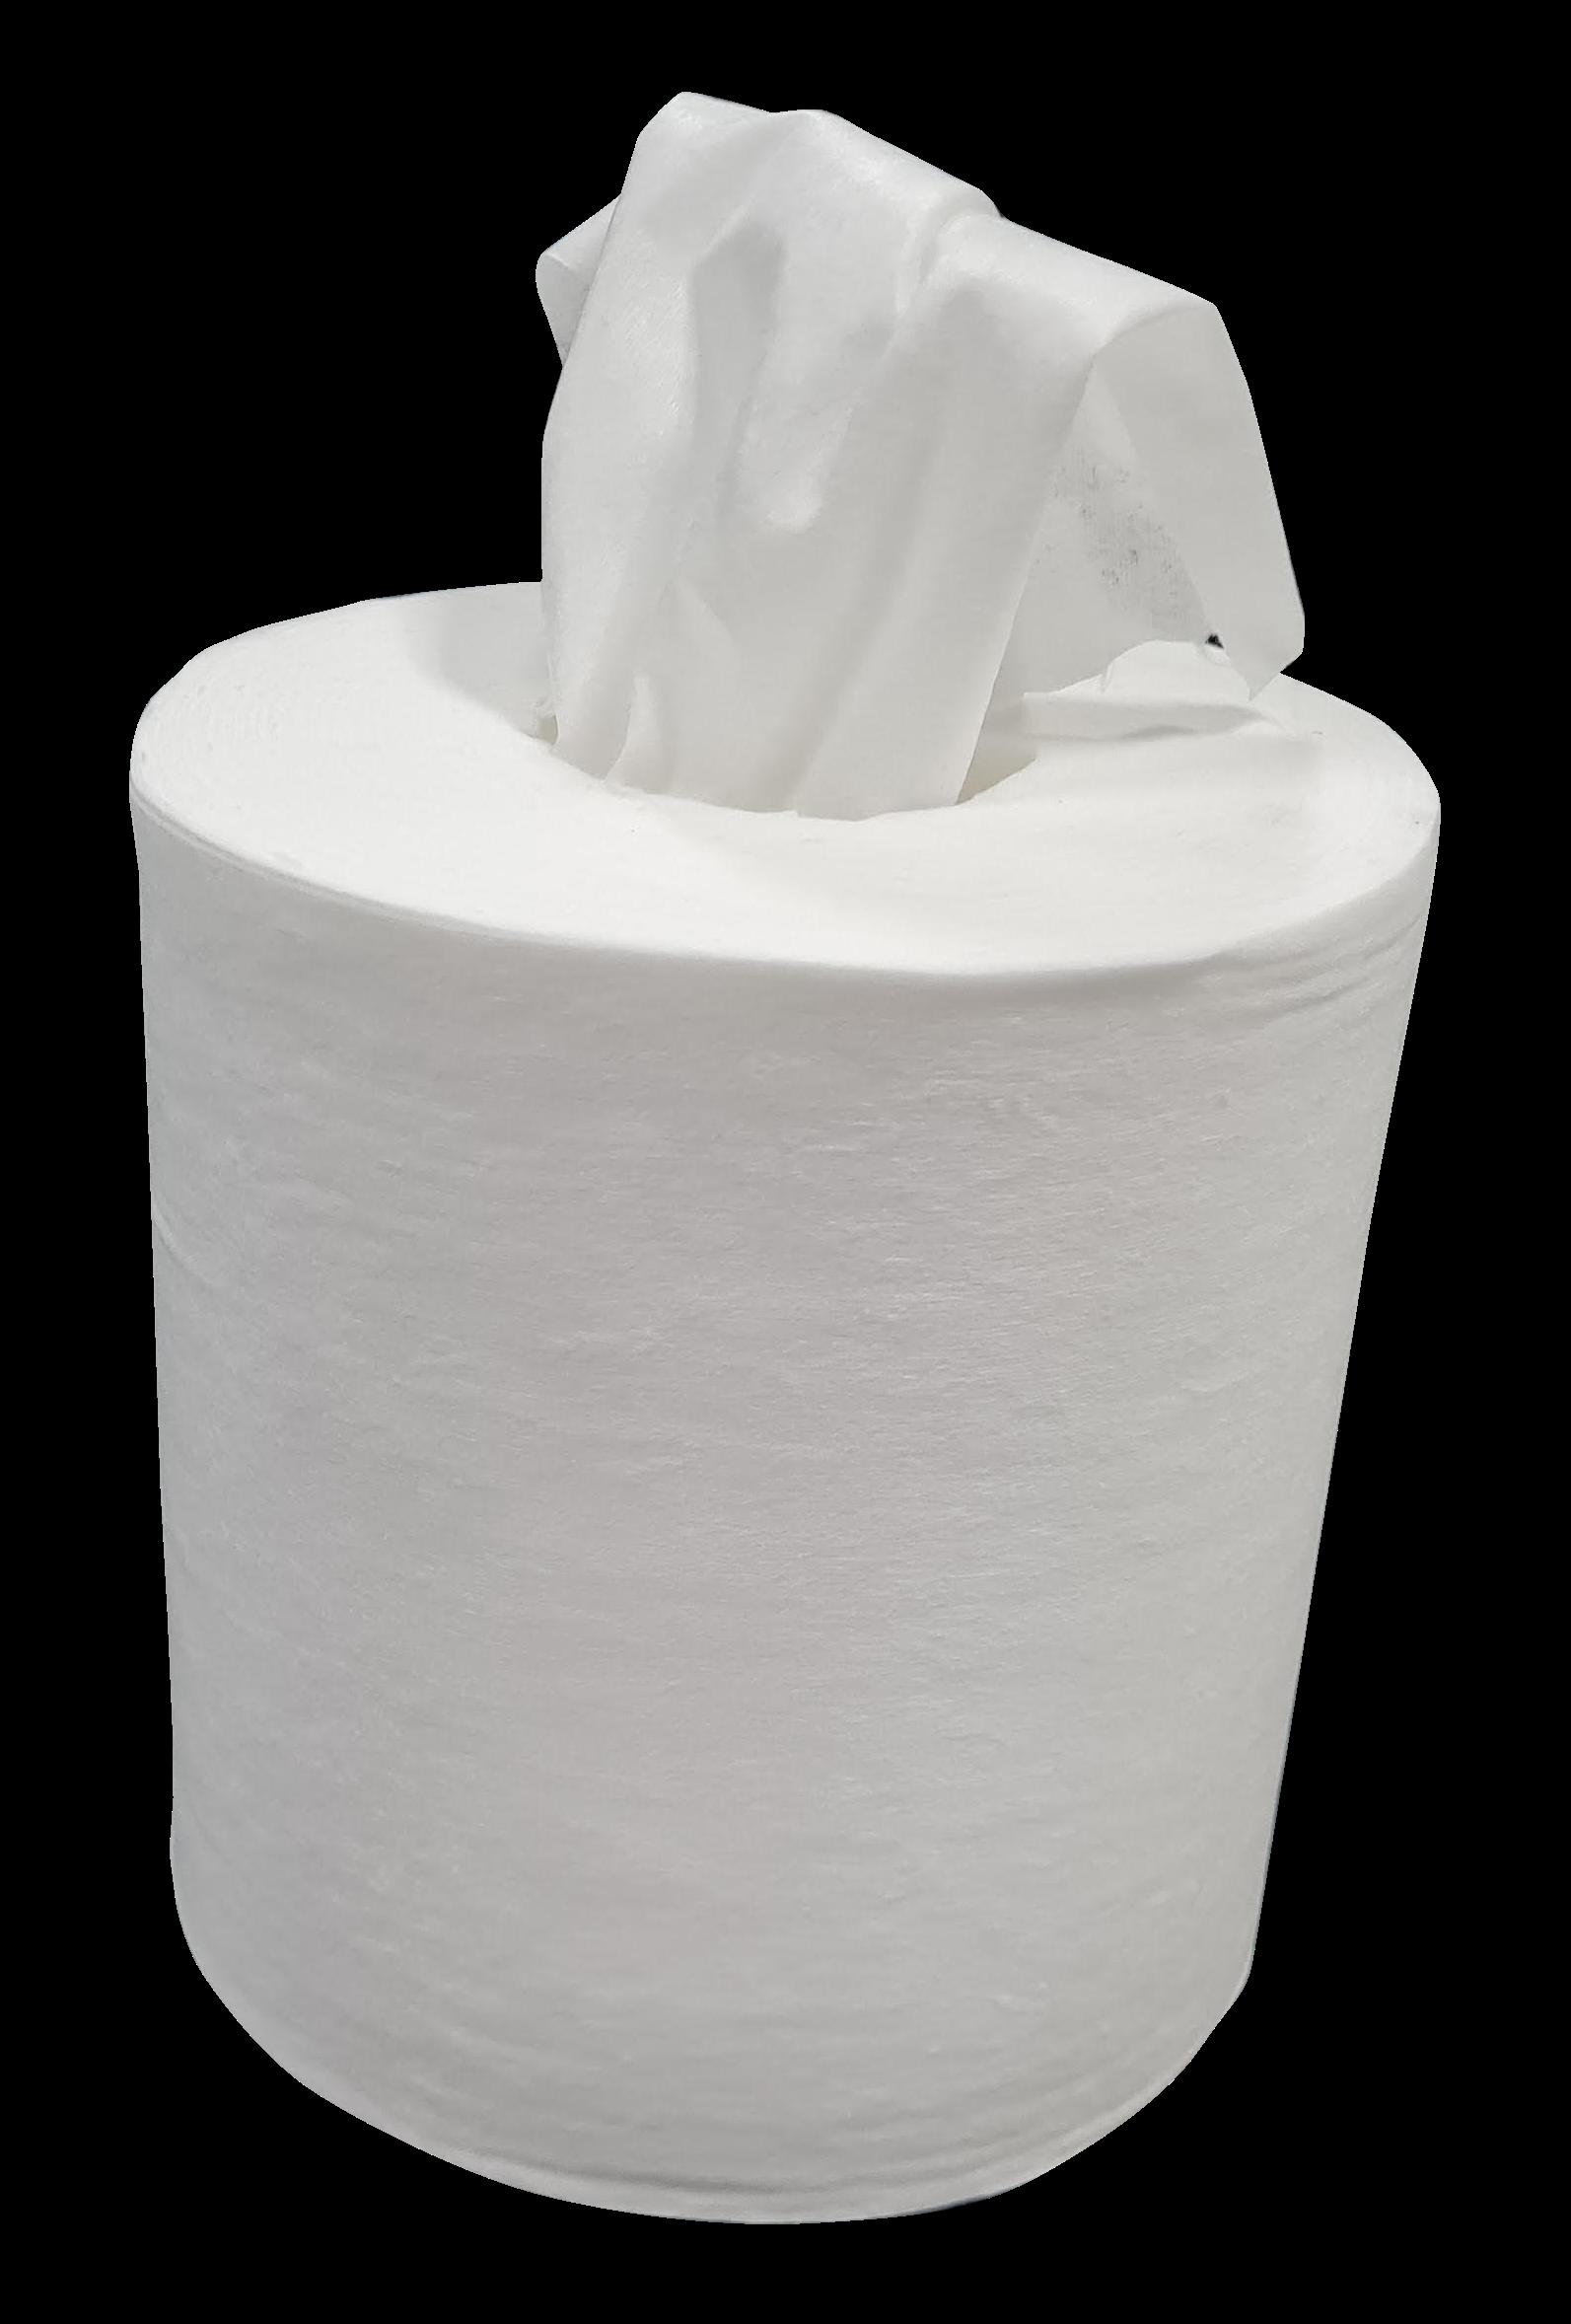 Softpolish stofwis doeken 60 x 20 cm